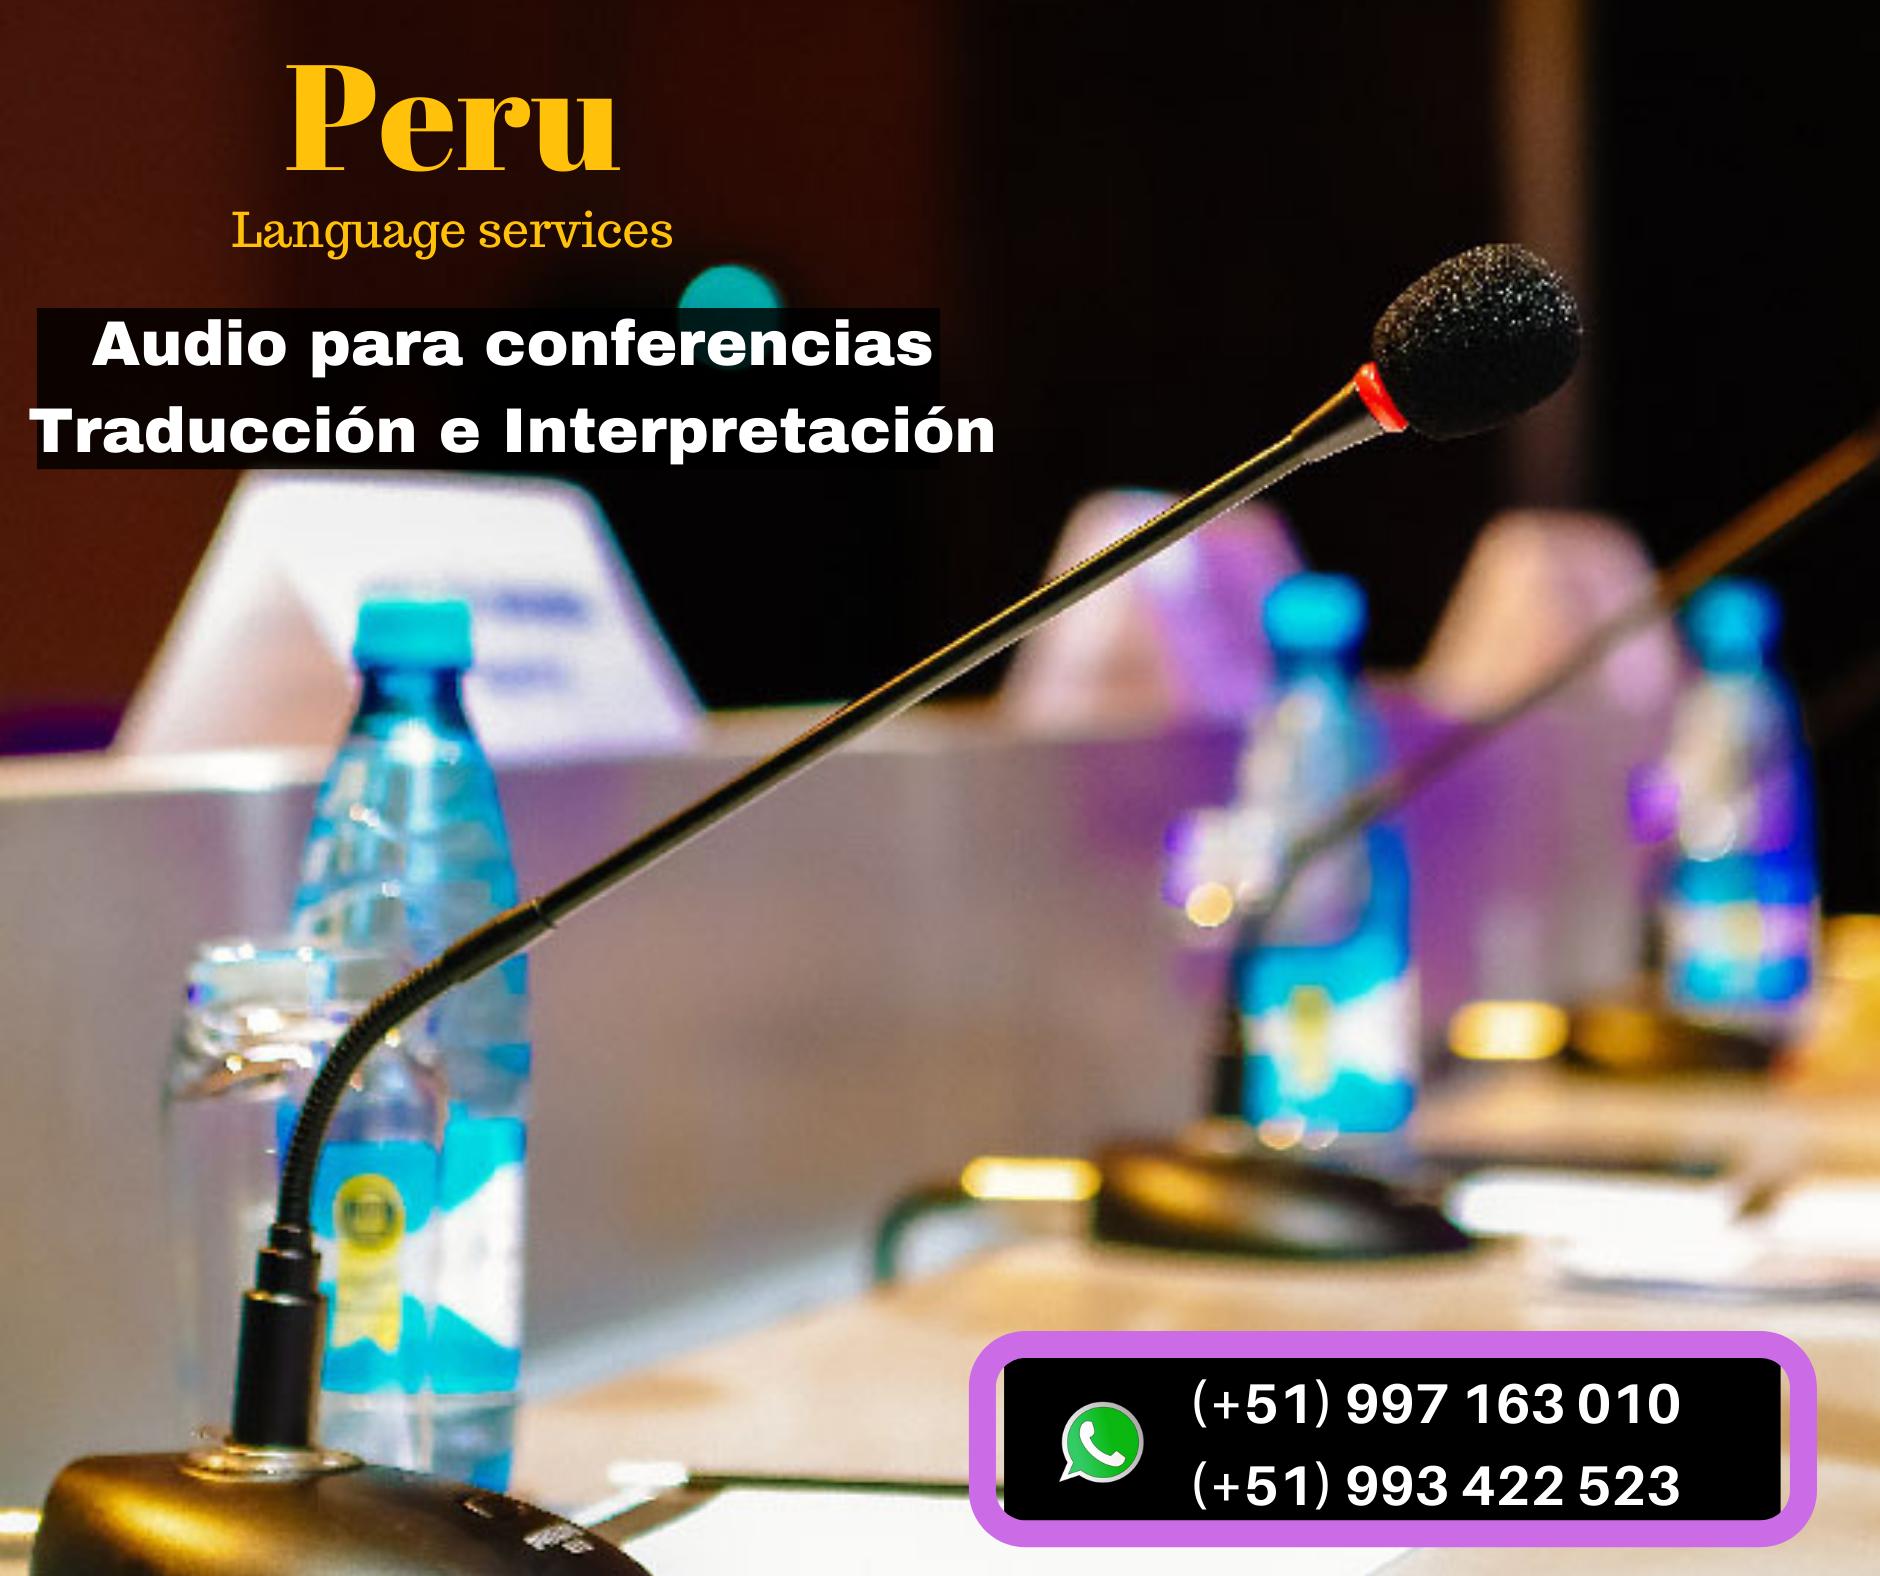 Micrófonos cuello ganso Lima /✅ C. (51) 997163010